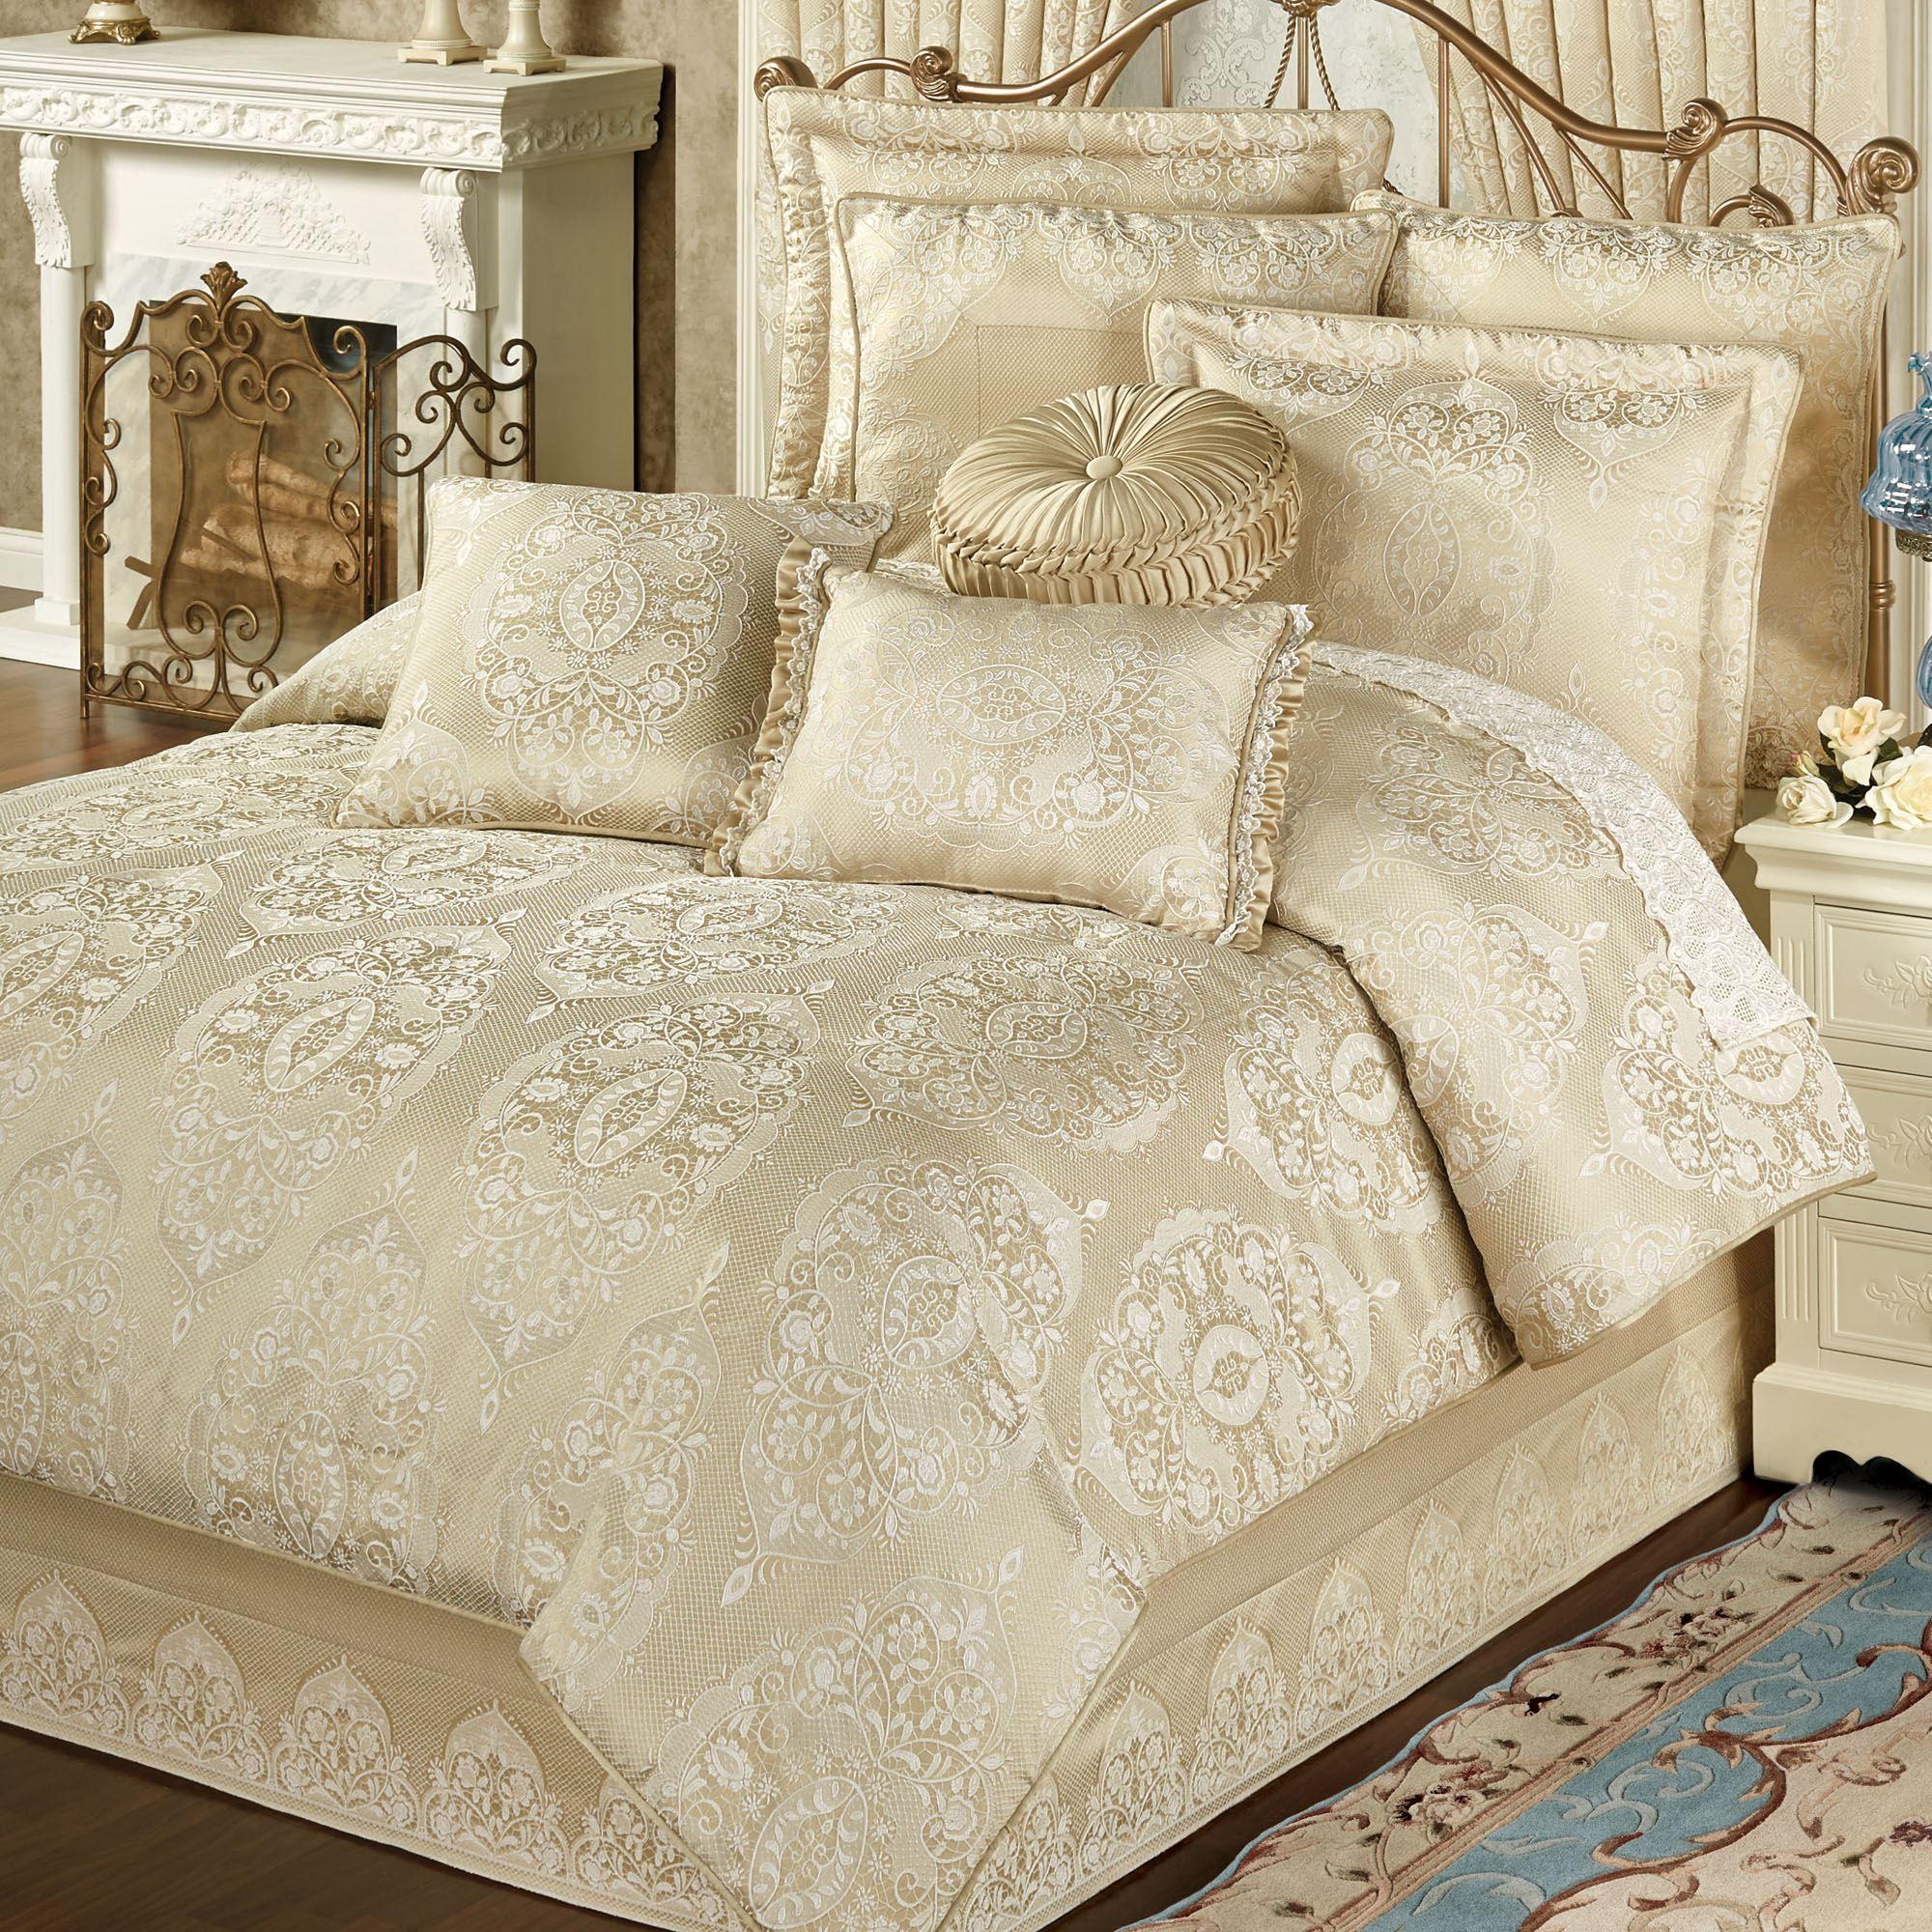 Francesca Light Gold Comforter Bedding Bed Linens Luxury Luxury